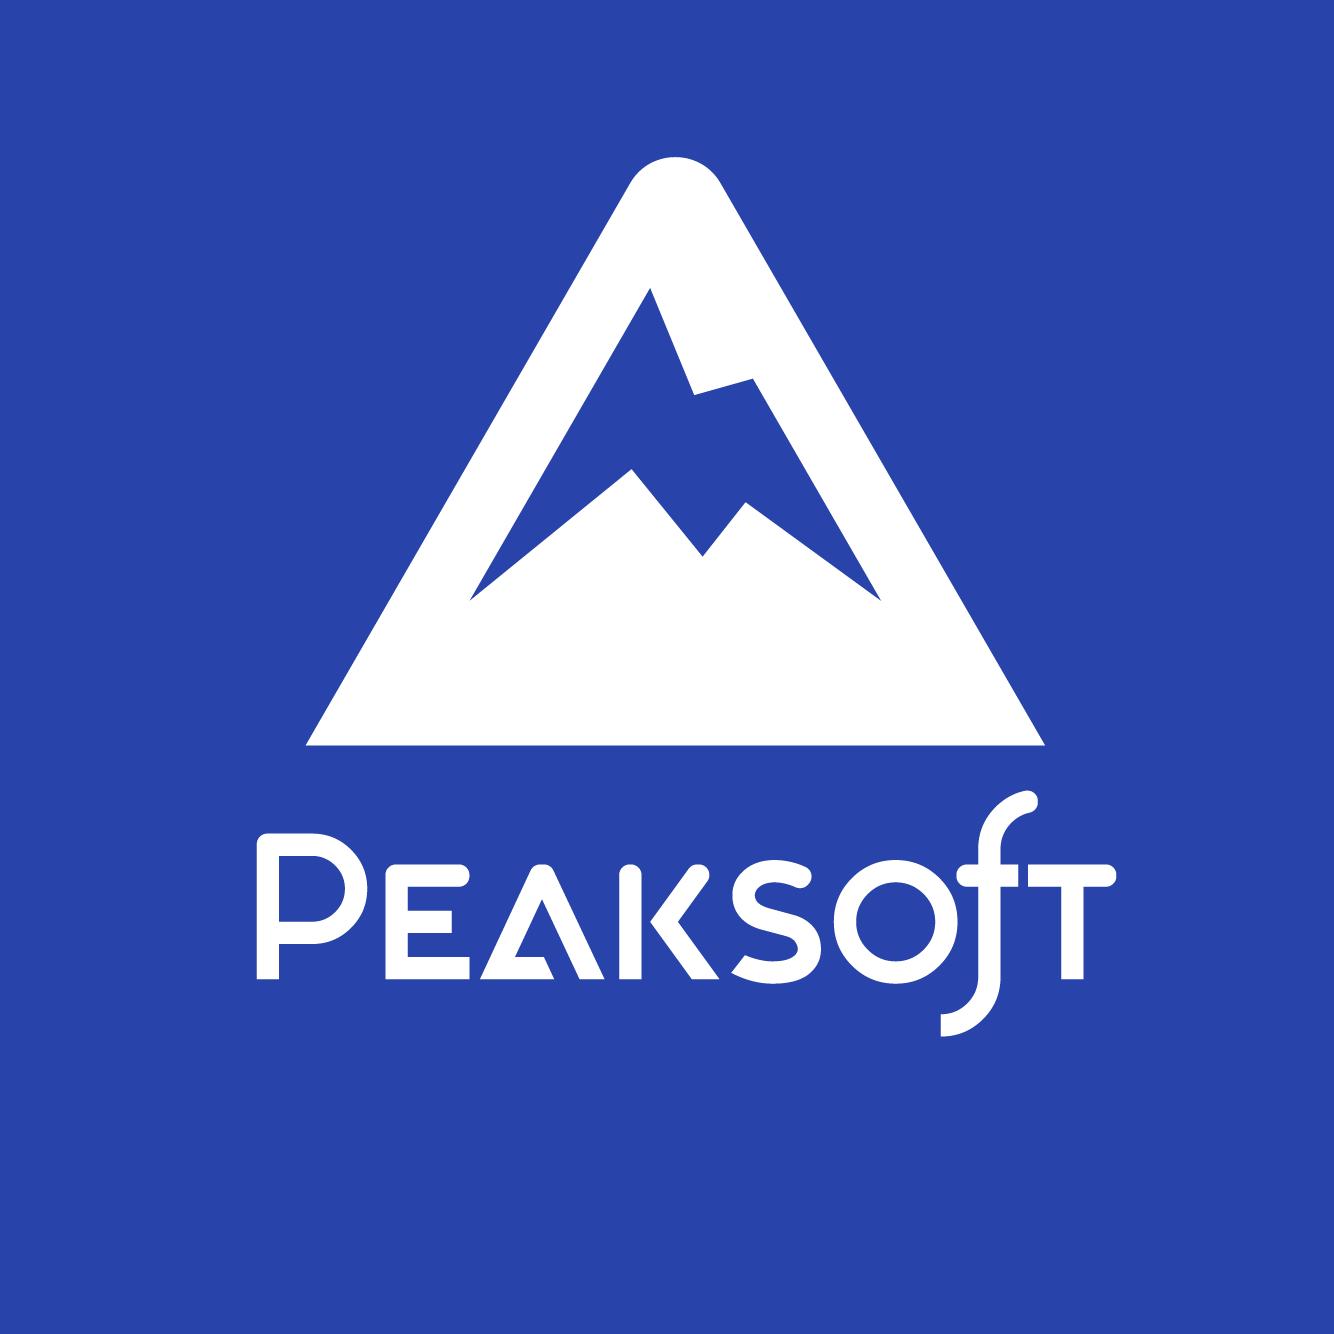 Peaksoft Logo